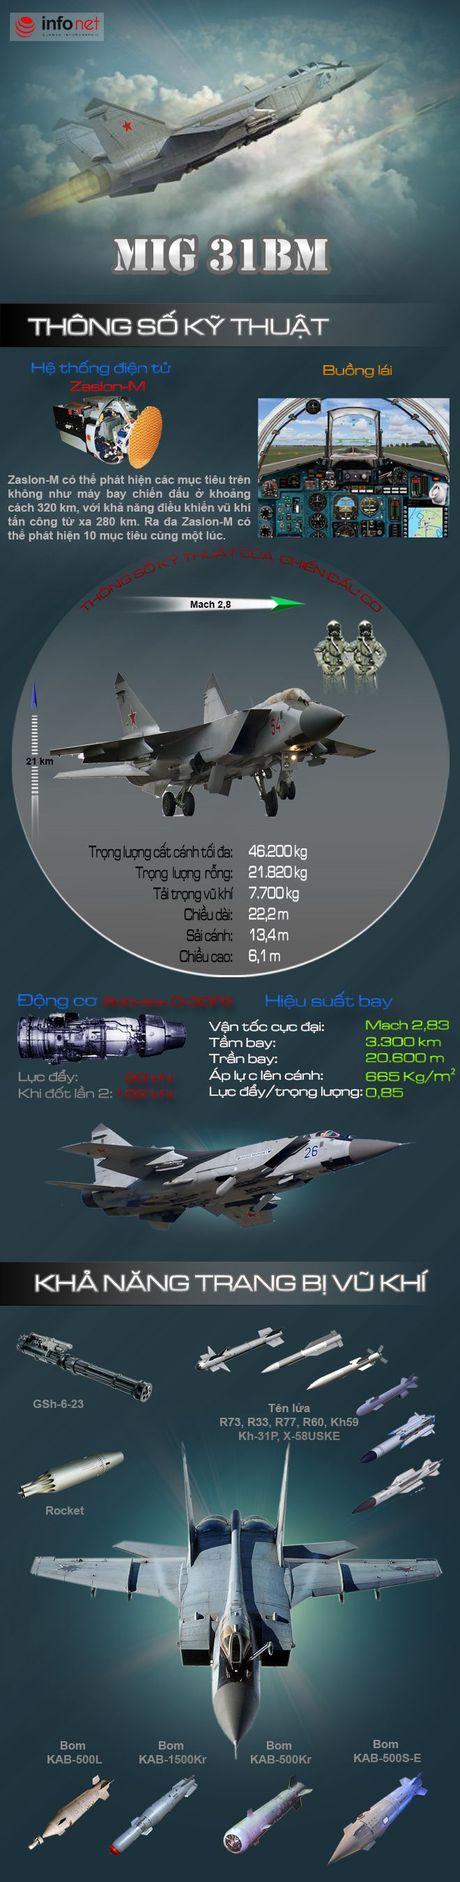 'Ma toc do' tiem kich danh chan MiG-31BM van chua co doi thu? - Anh 3